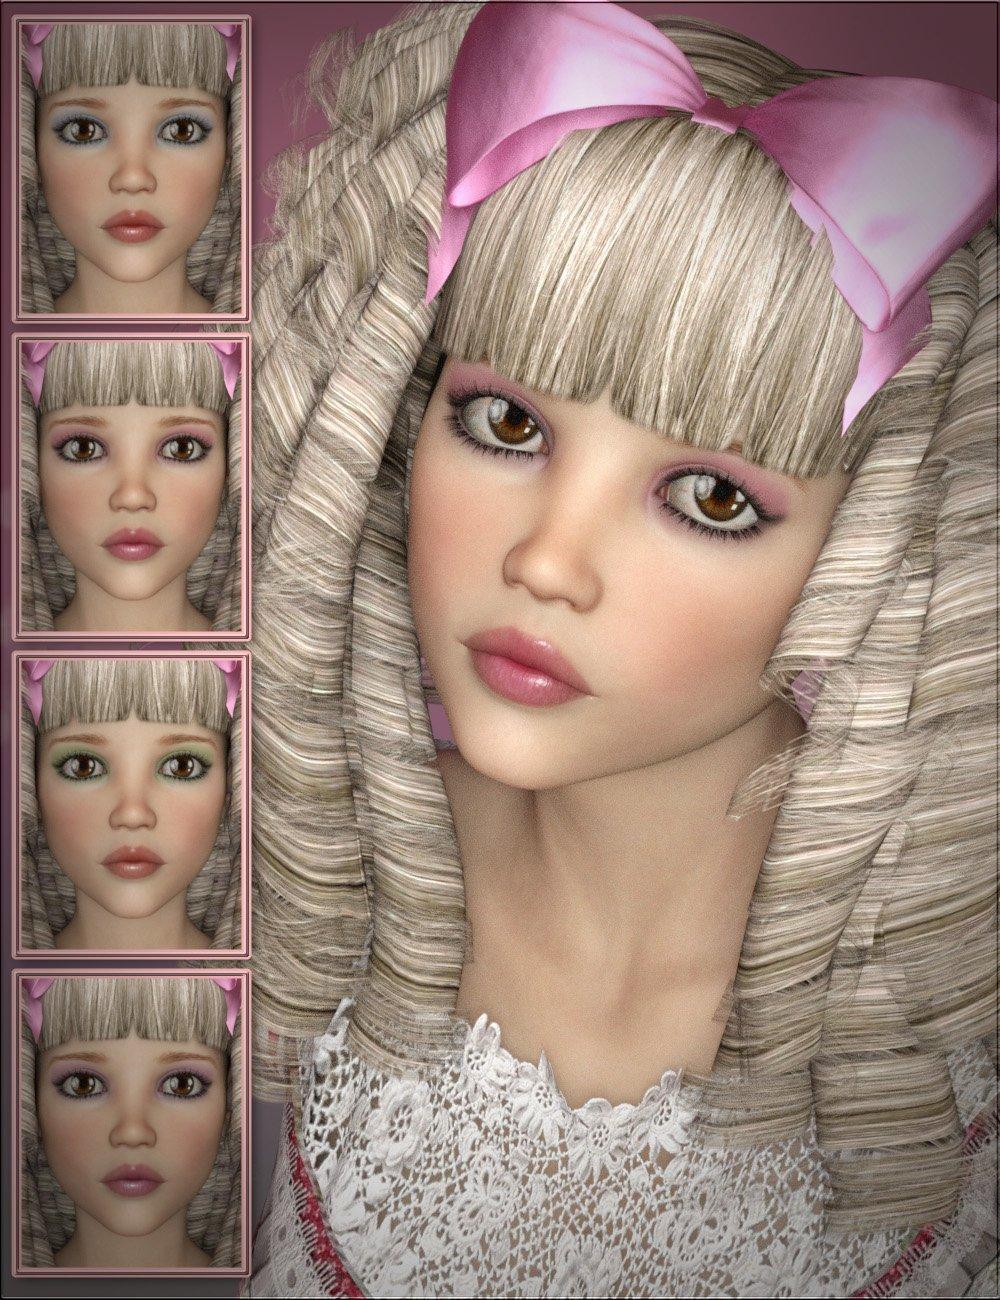 VYK Dolly for Teen Josie 8 by: vyktohria, 3D Models by Daz 3D